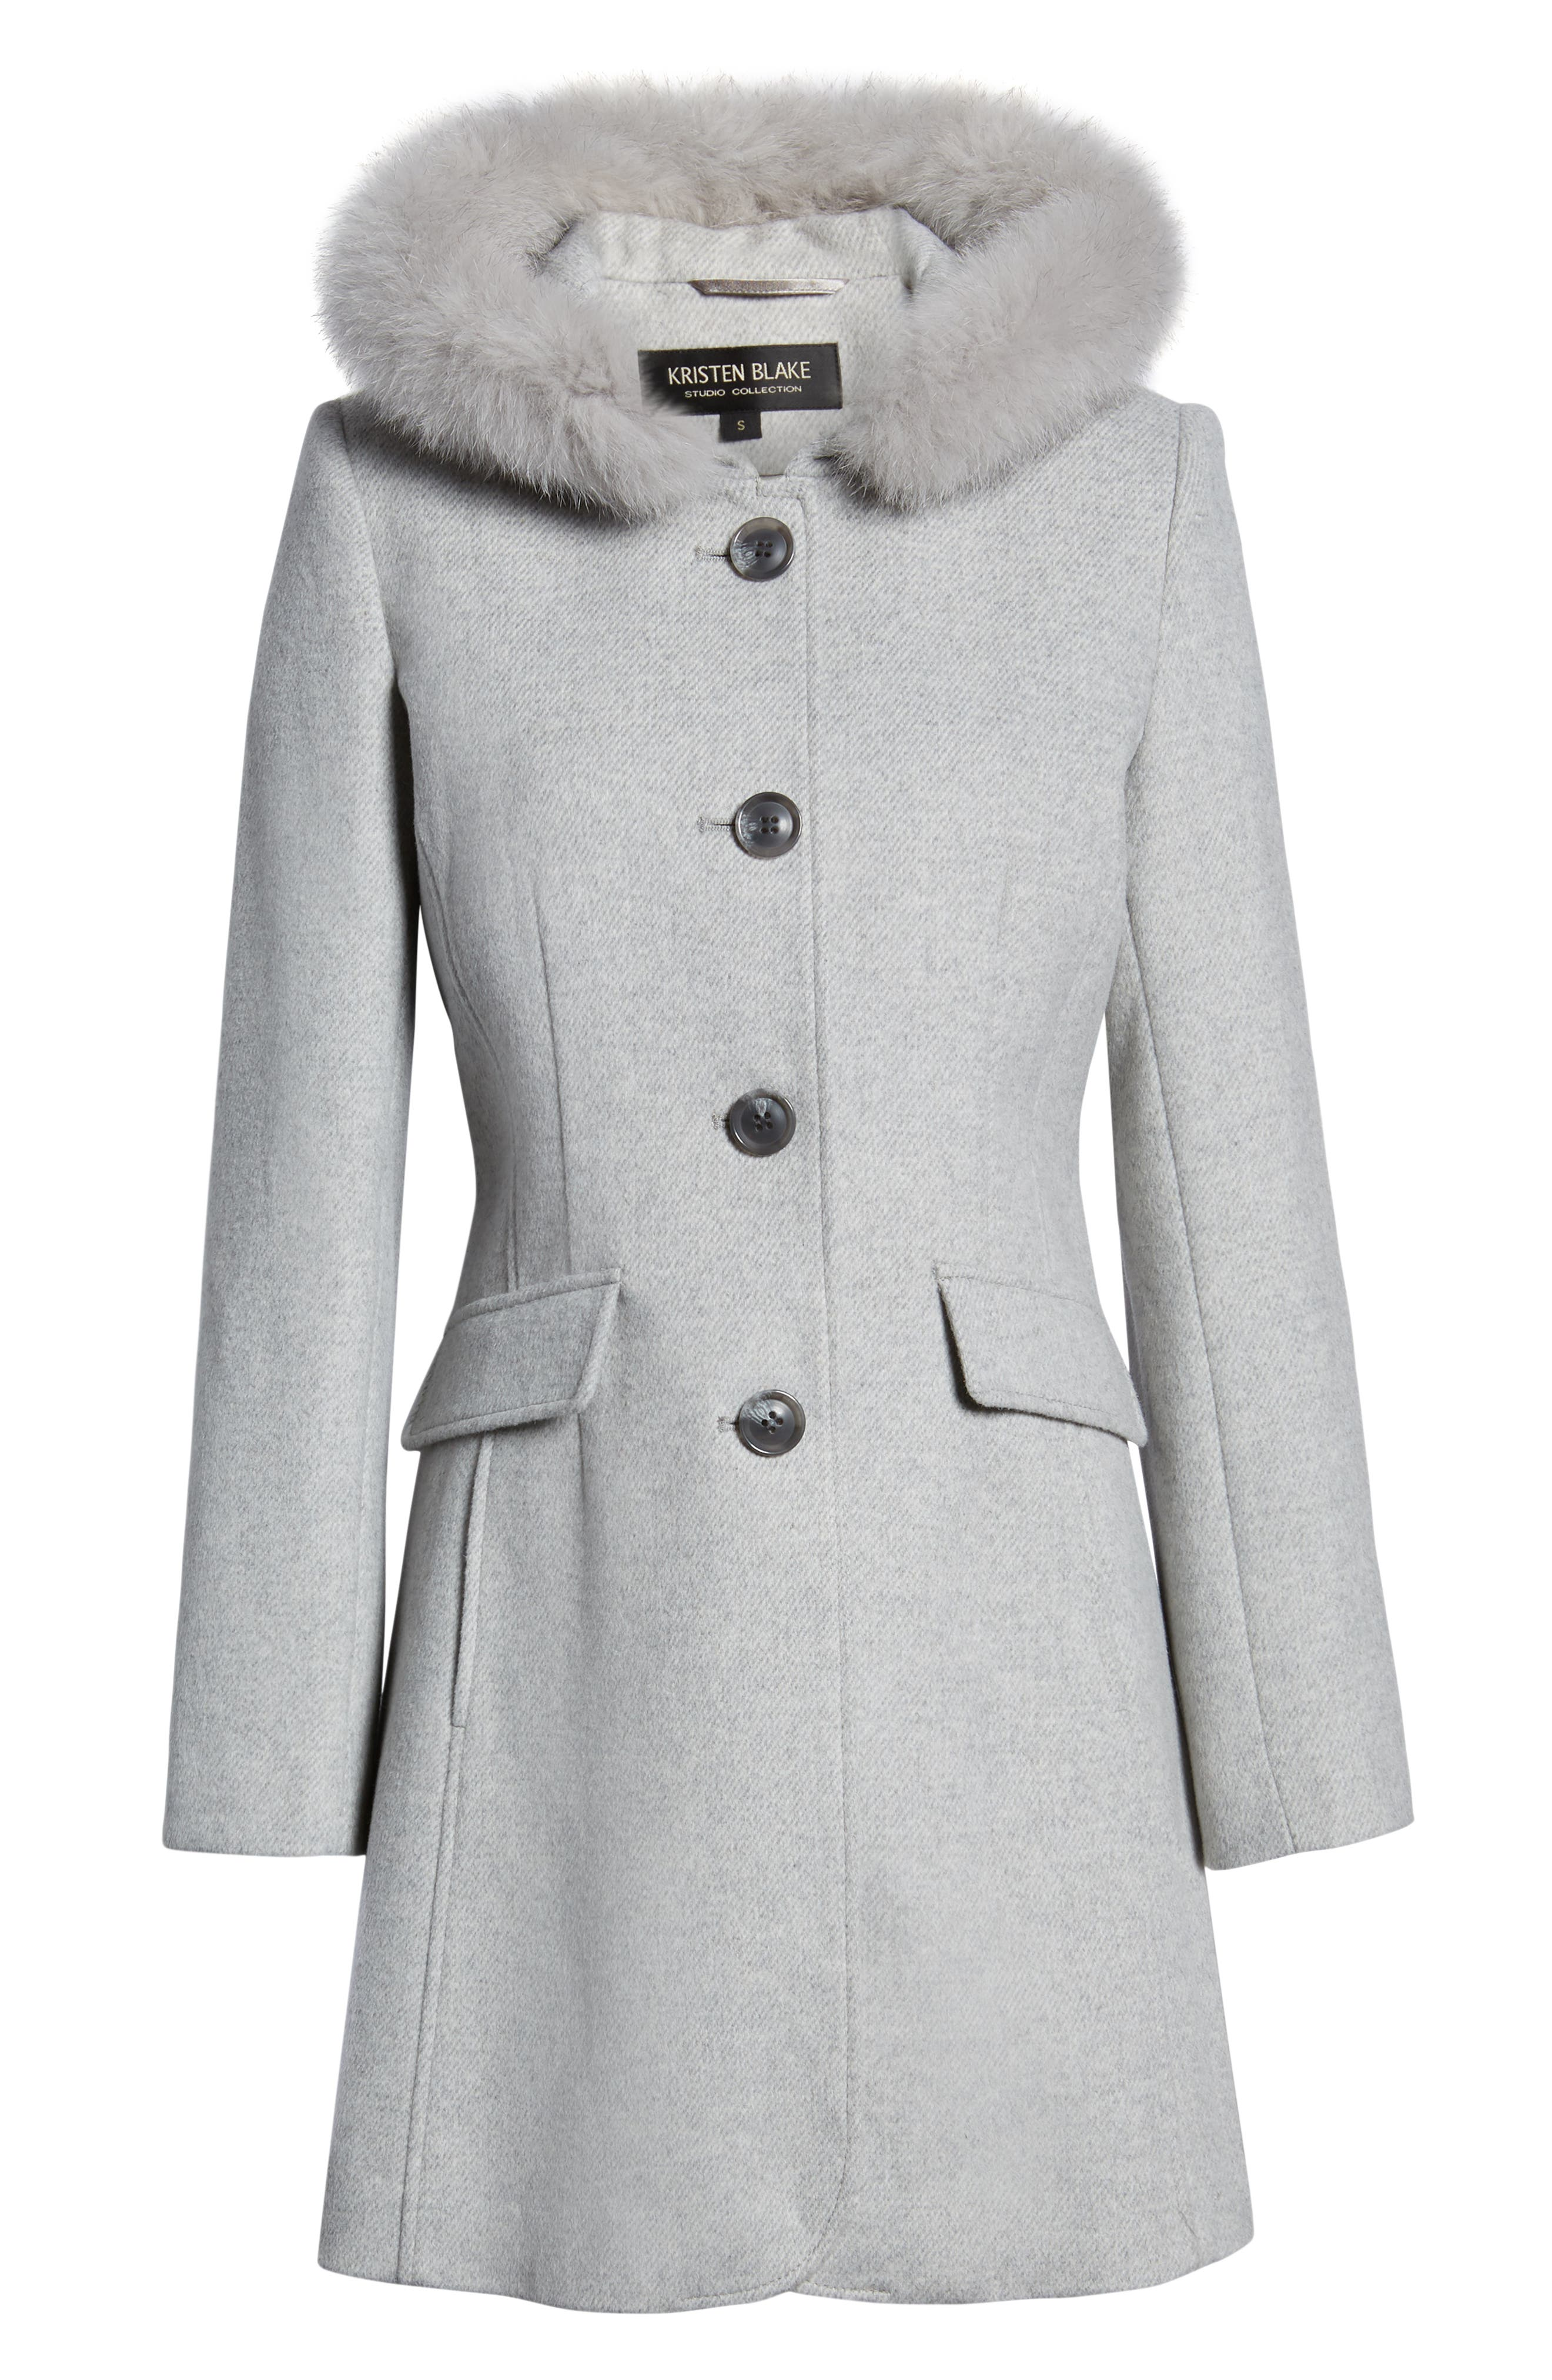 KRISTEN BLAKE,                             Genuine Fox Trim Hooded Wool Coat,                             Alternate thumbnail 6, color,                             GREY MELANGE